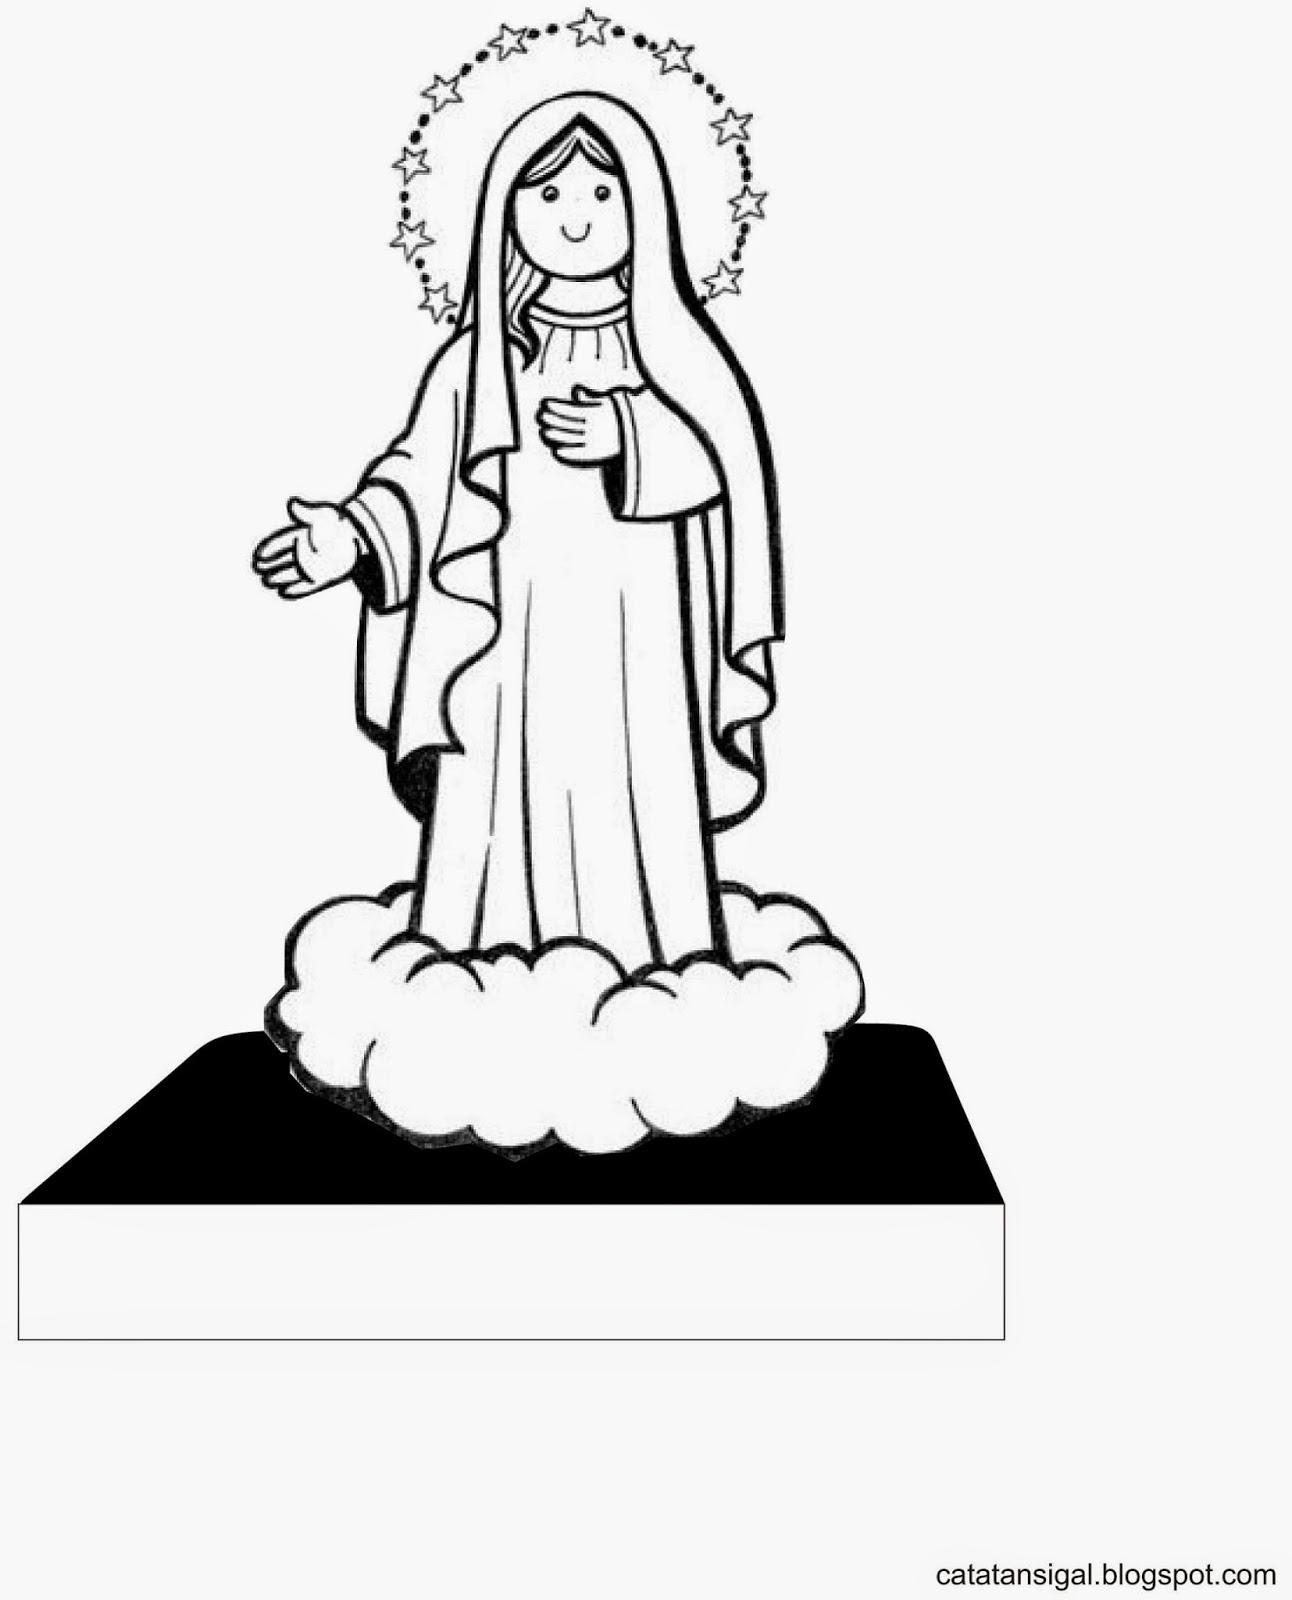 Catatan SiGal Bahan Kreativitas Sekolah Minggu Hari Raya Maria